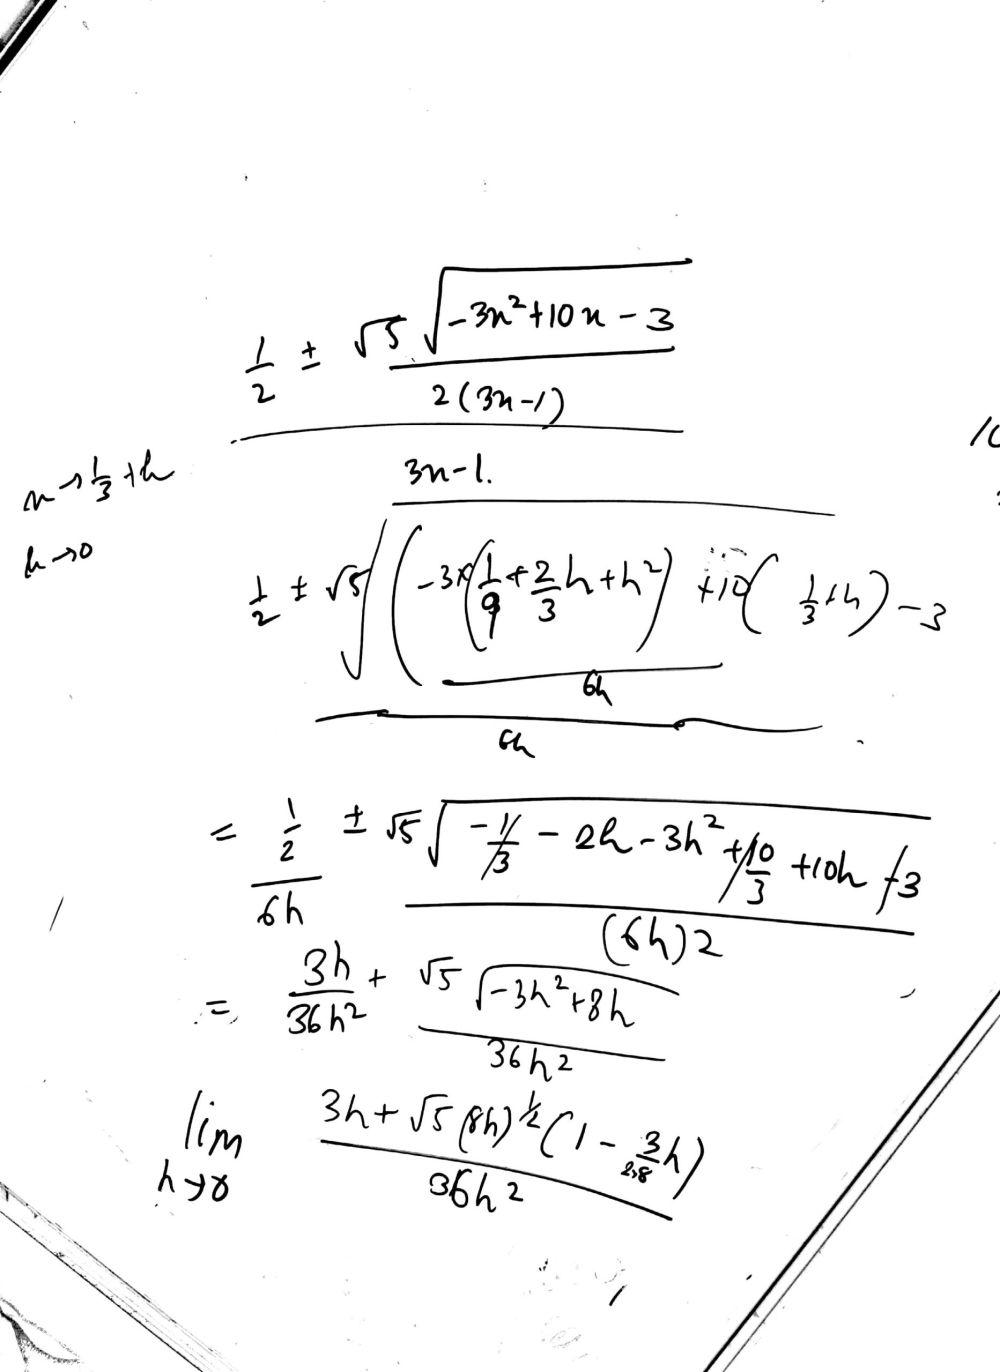 medium resolution of 5 Free Math Worksheets Third Grade 3 Multiplication Multiply Columns 1  Digit 3 Digit - apocalomegaproductions.com